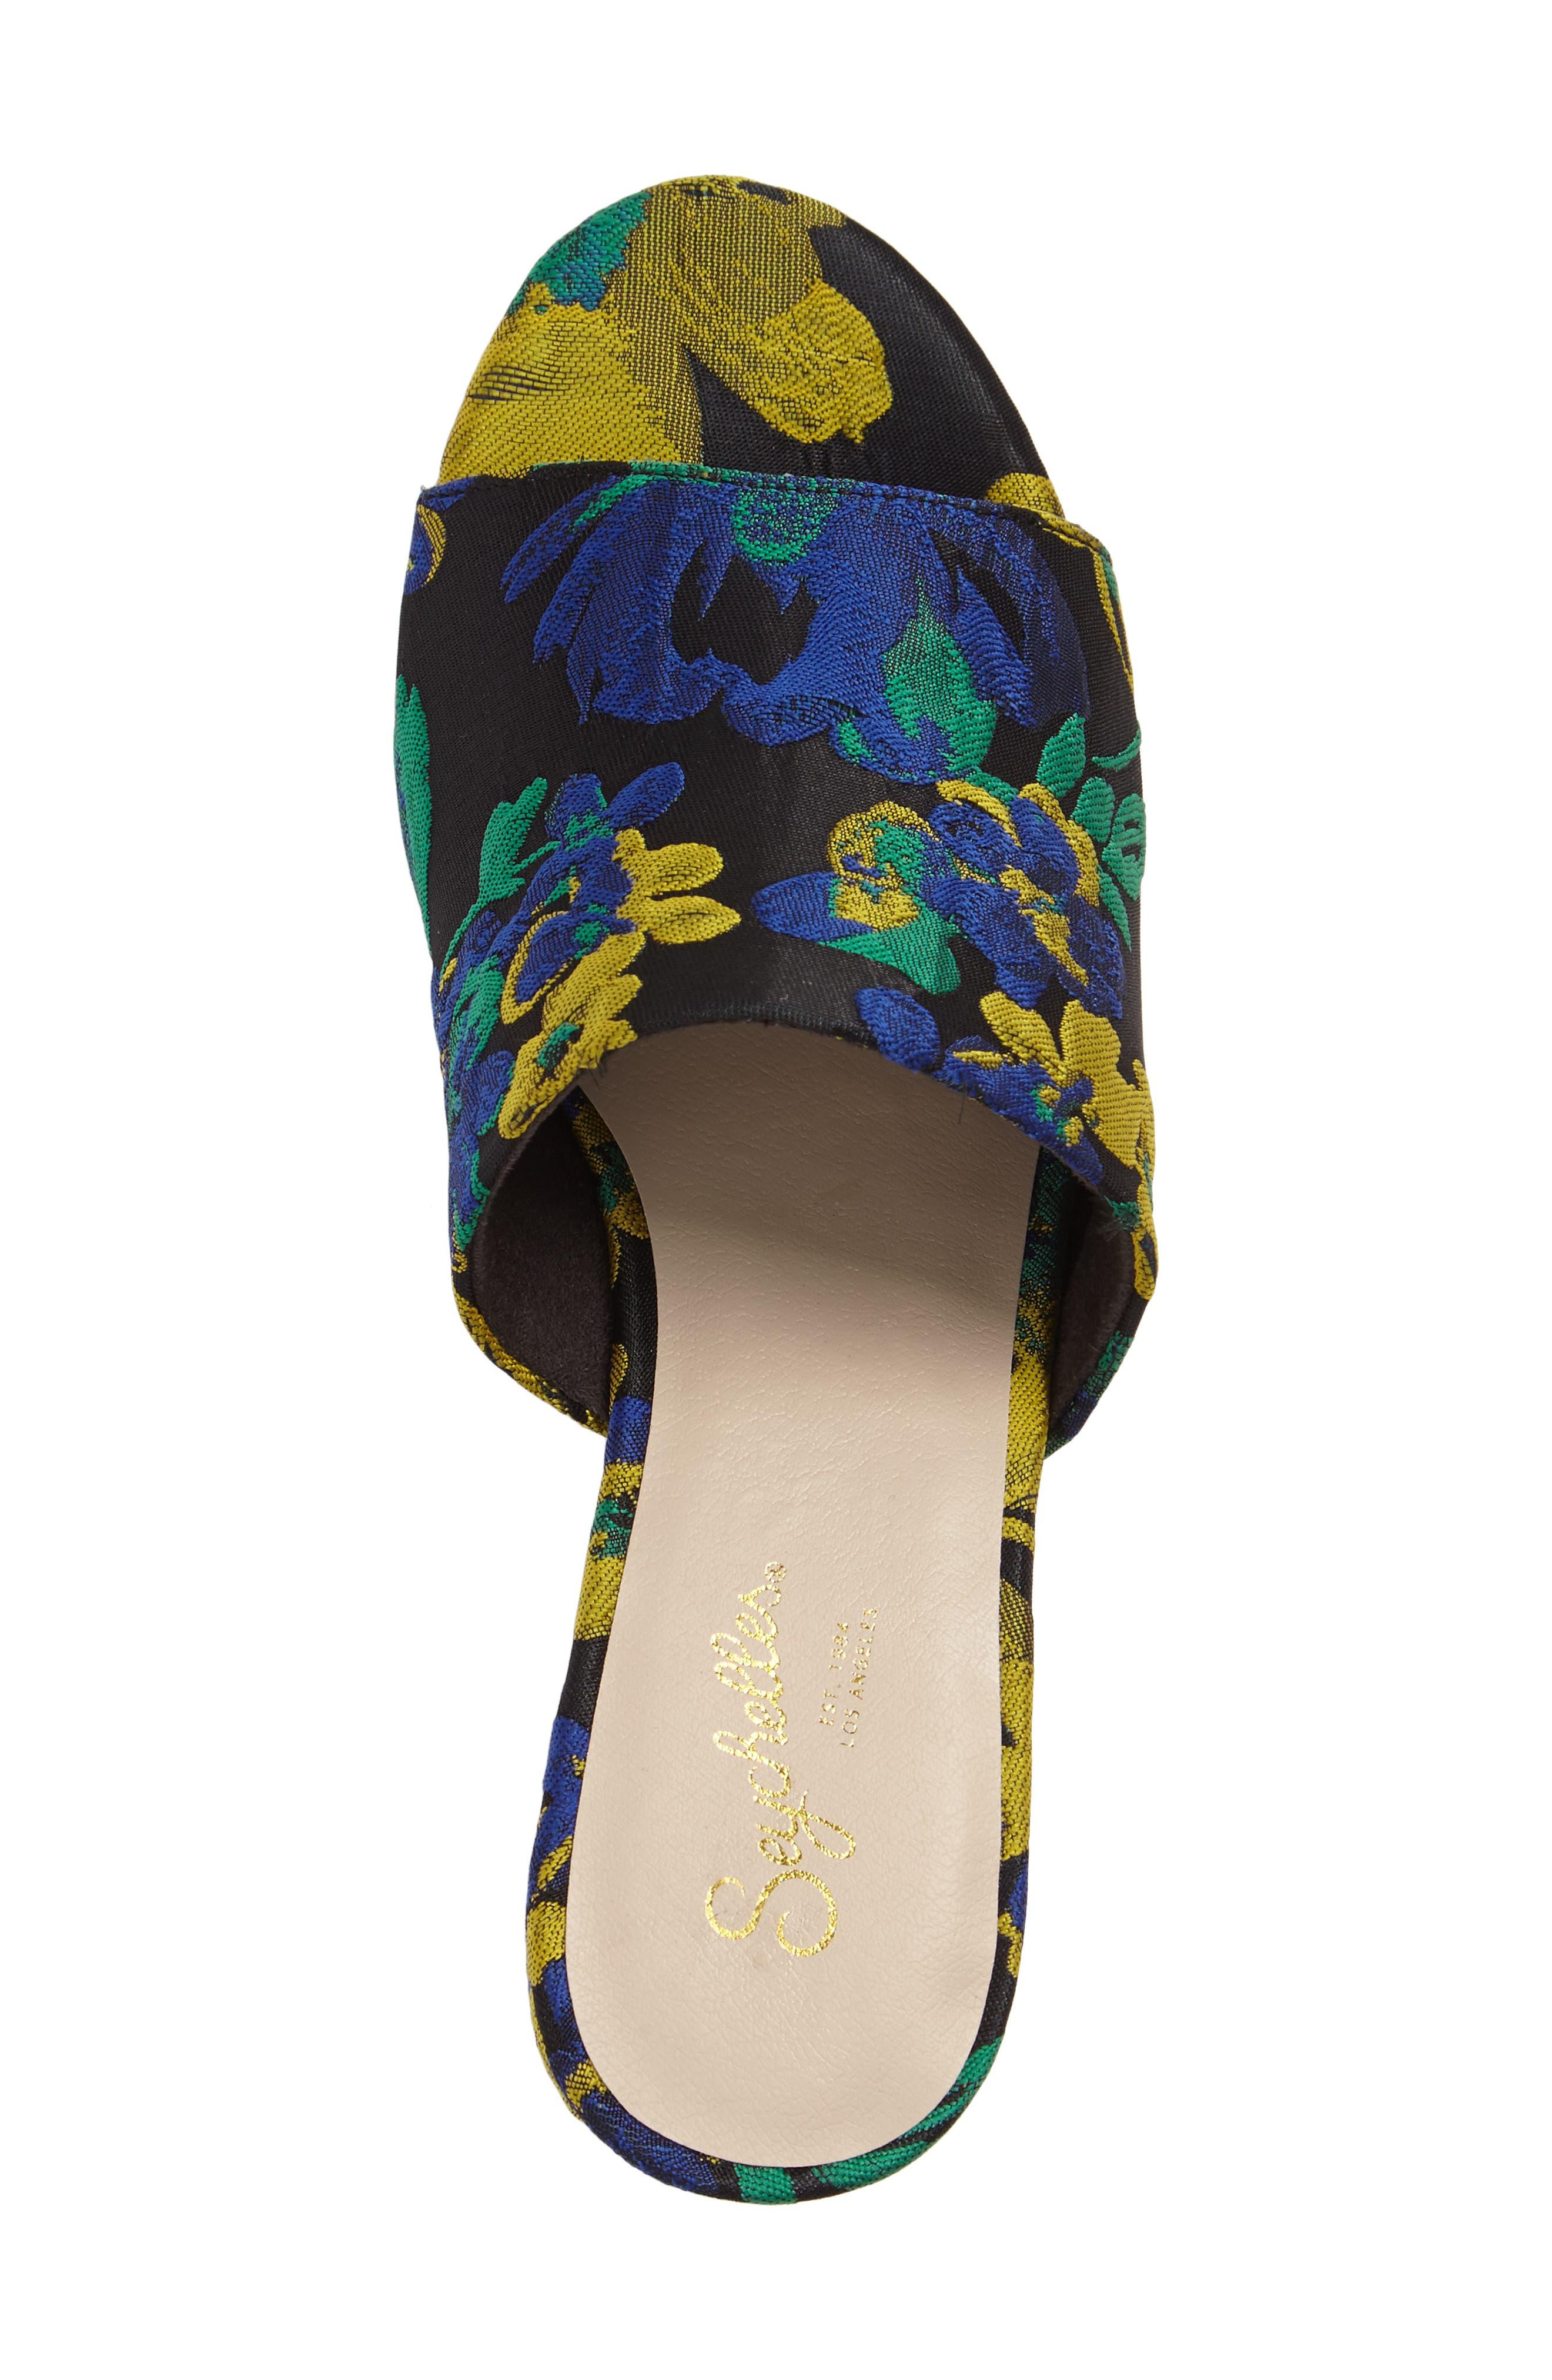 Commute Floral Flared Heel Sandal,                             Alternate thumbnail 5, color,                             002